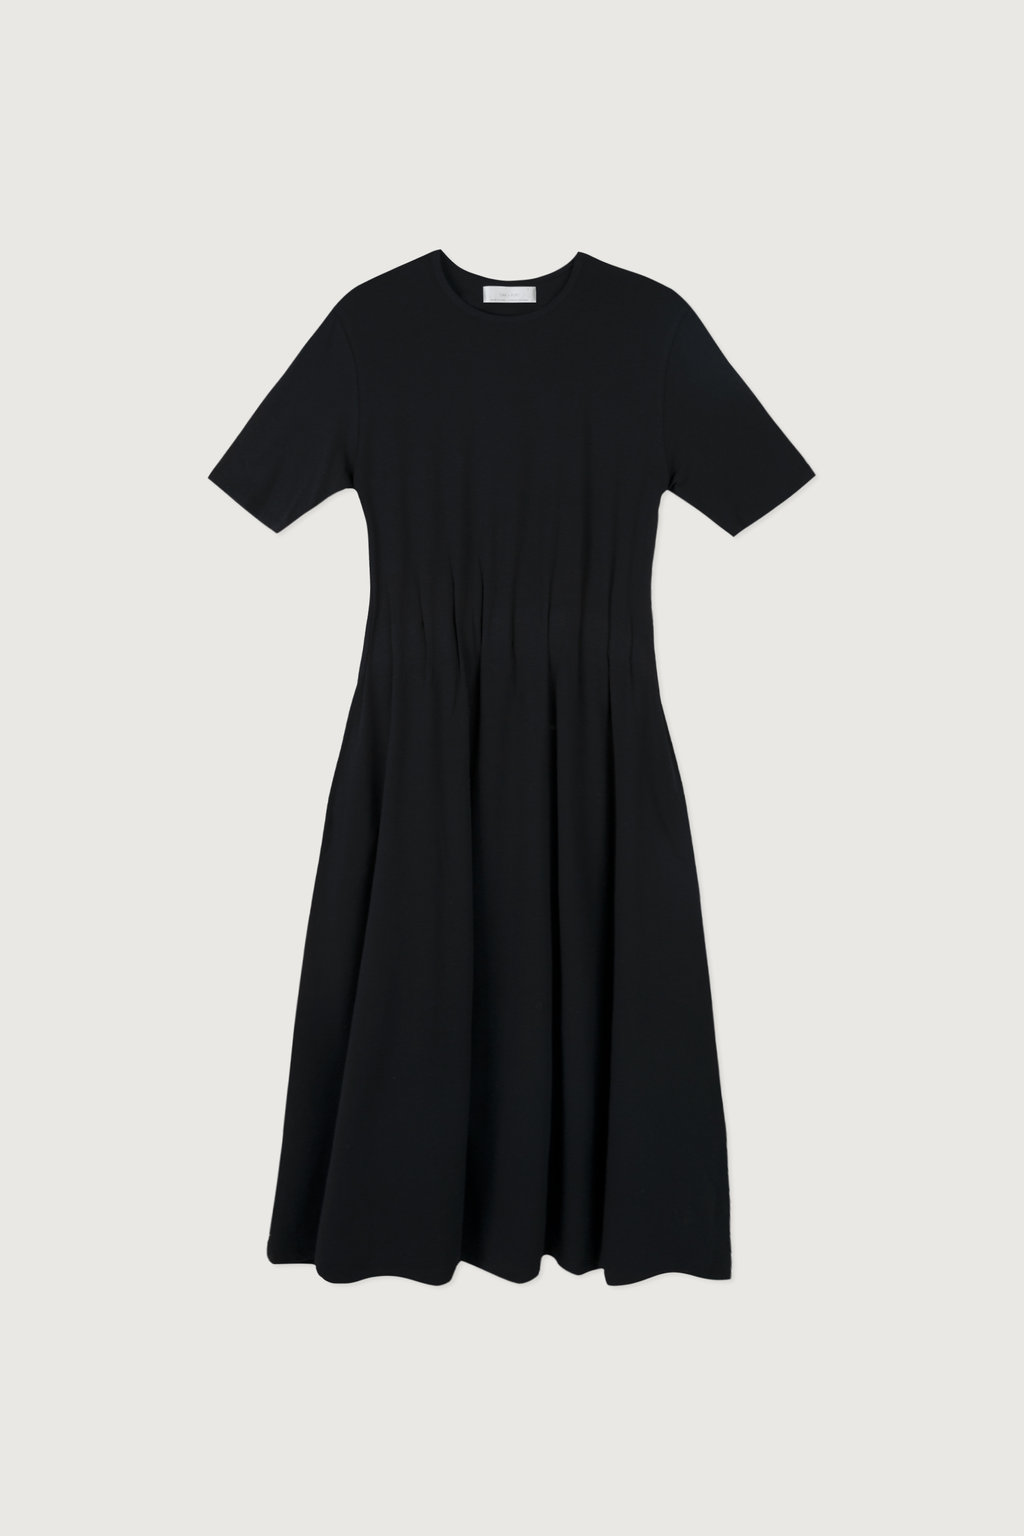 Dress 3262 Black 7